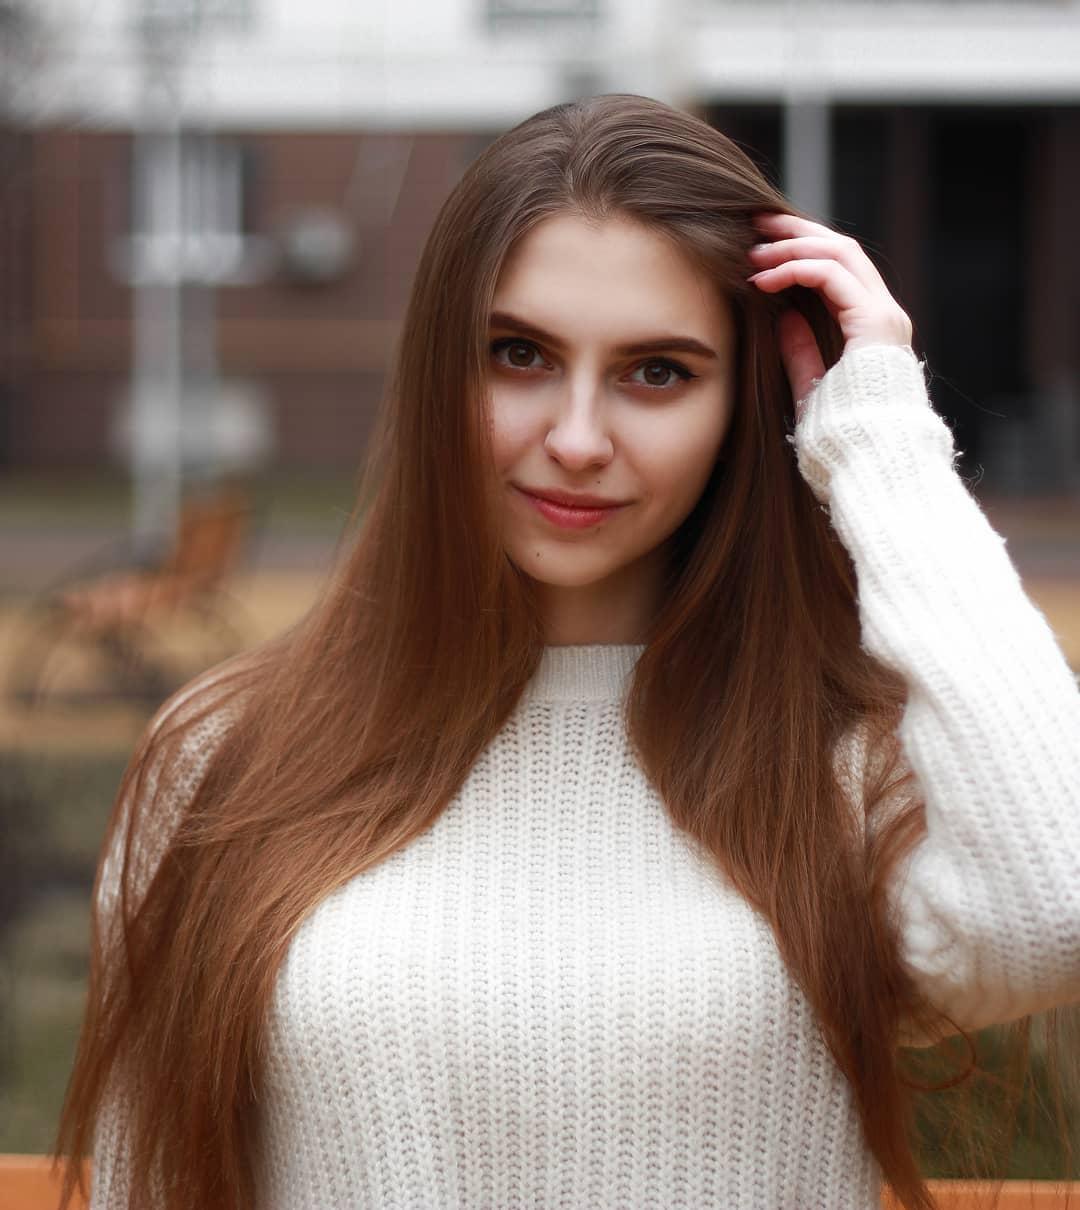 Katya-Melnyk-Wallpapers-Insta-Biography-9